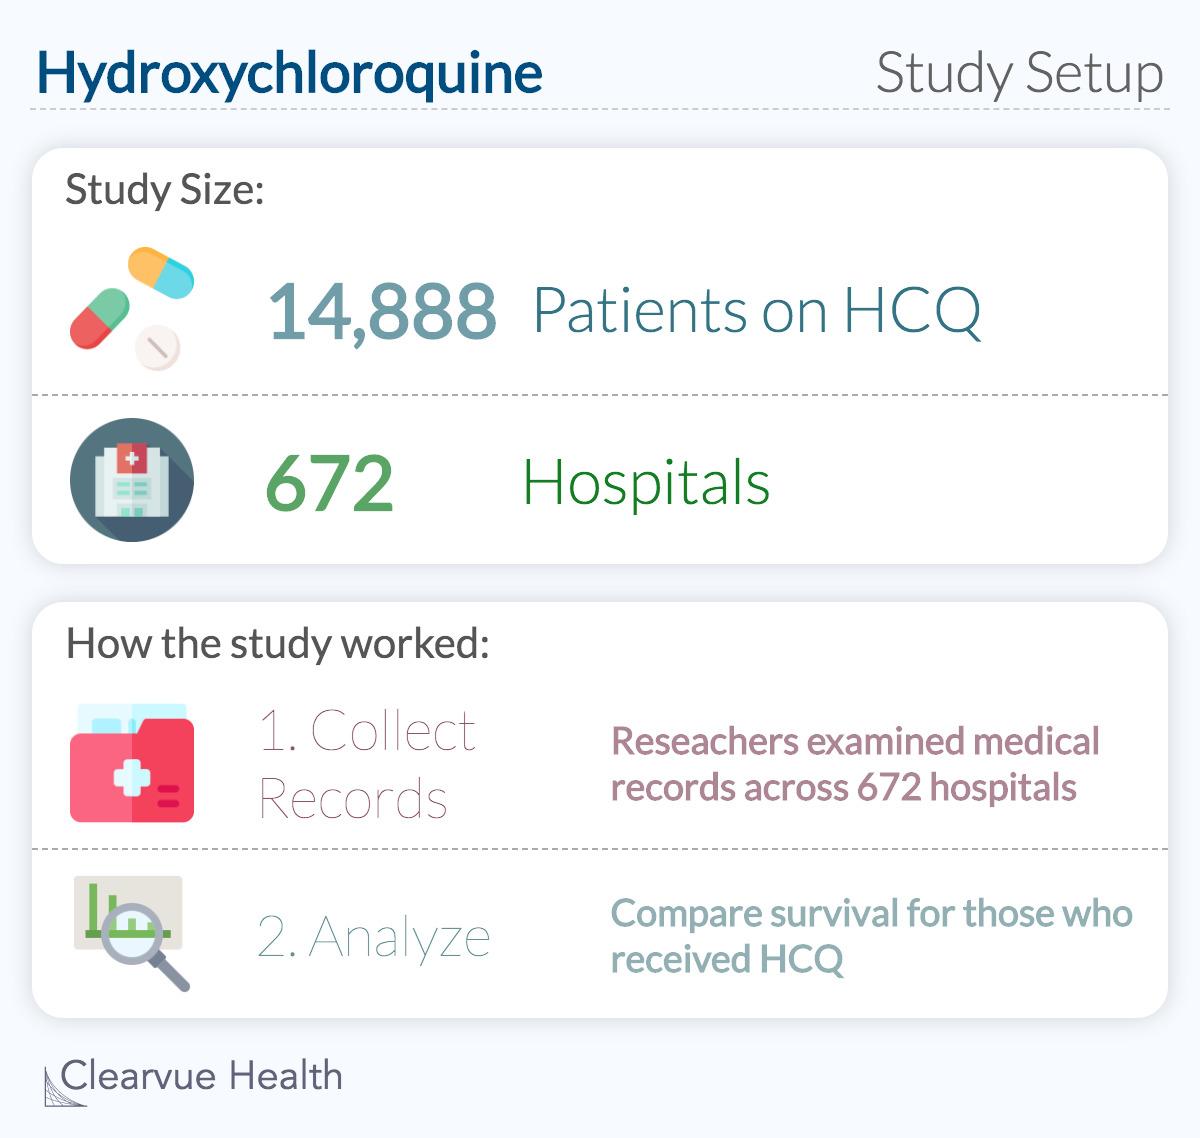 The Lancet Hydroxychloroquine Study Setup